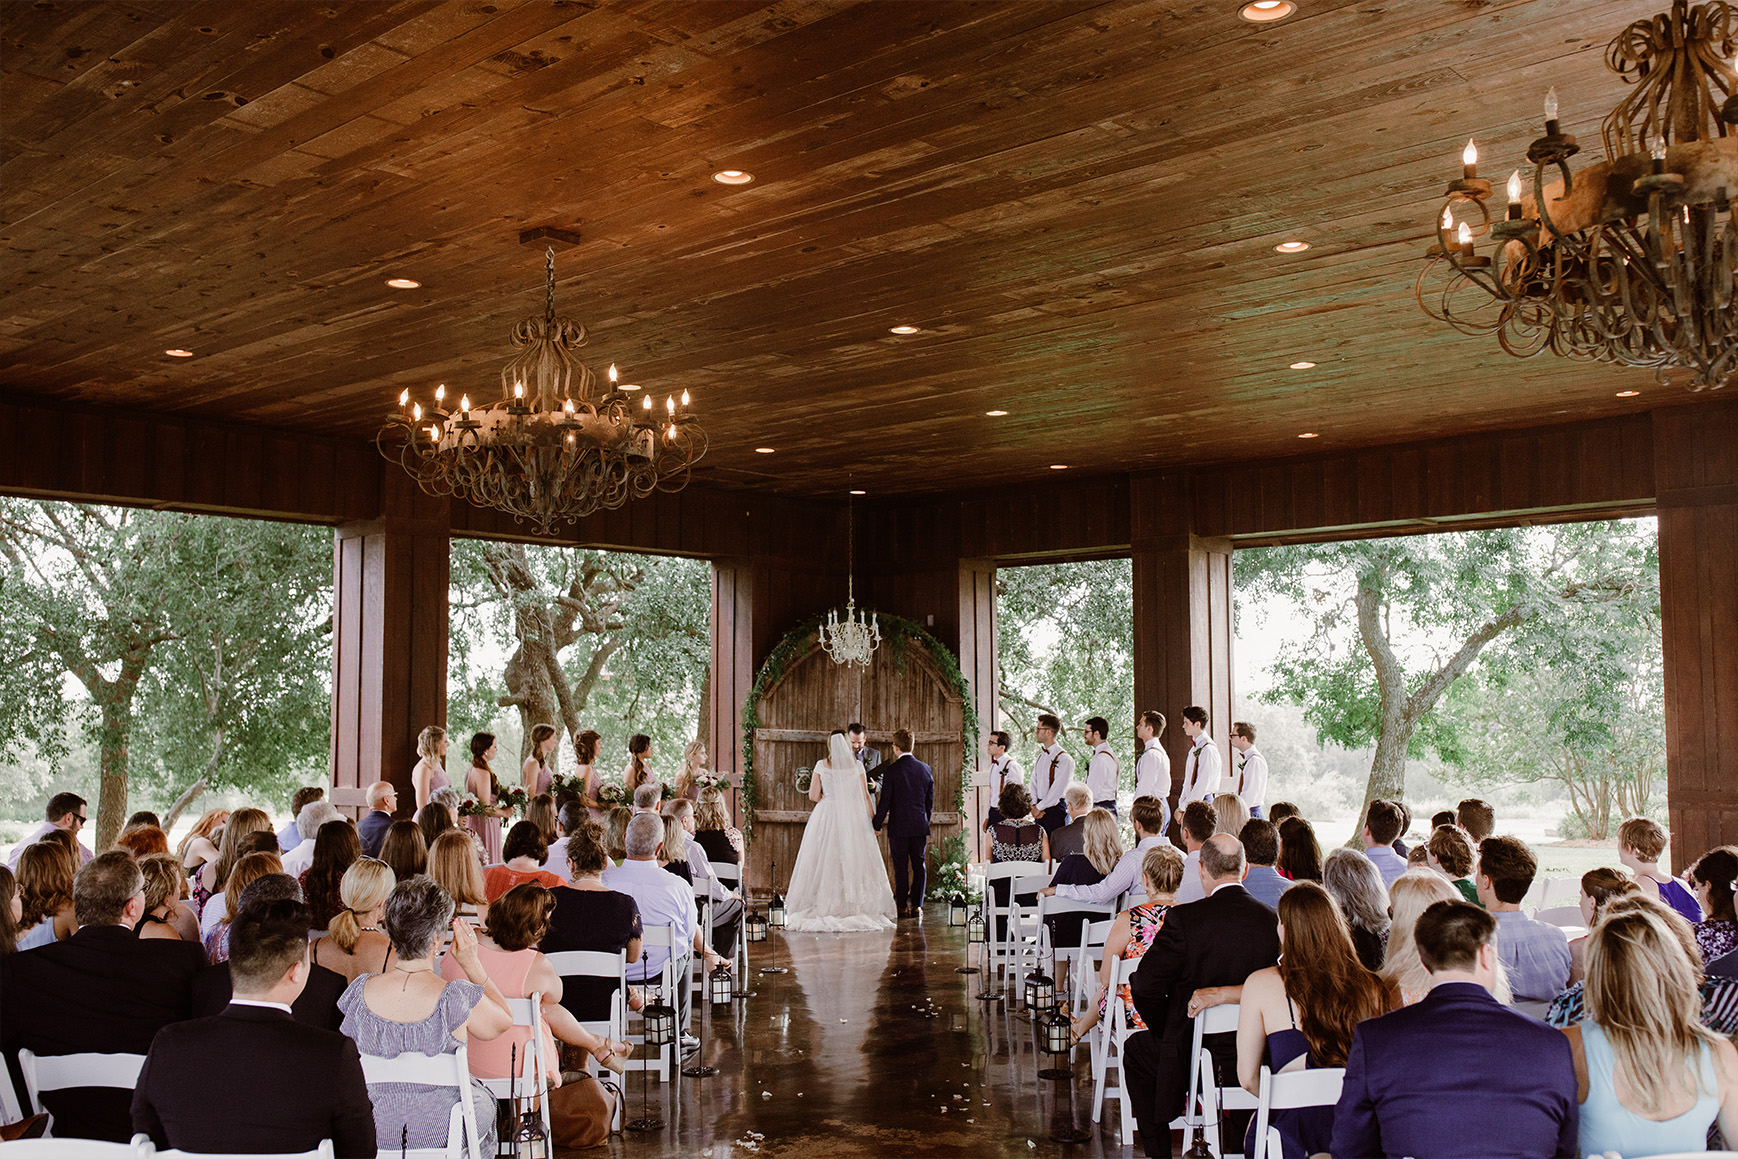 Indoor Ceremony  - Hofmann Ranch - Castroville, Texas - Medina County - Wedgewood Weddings